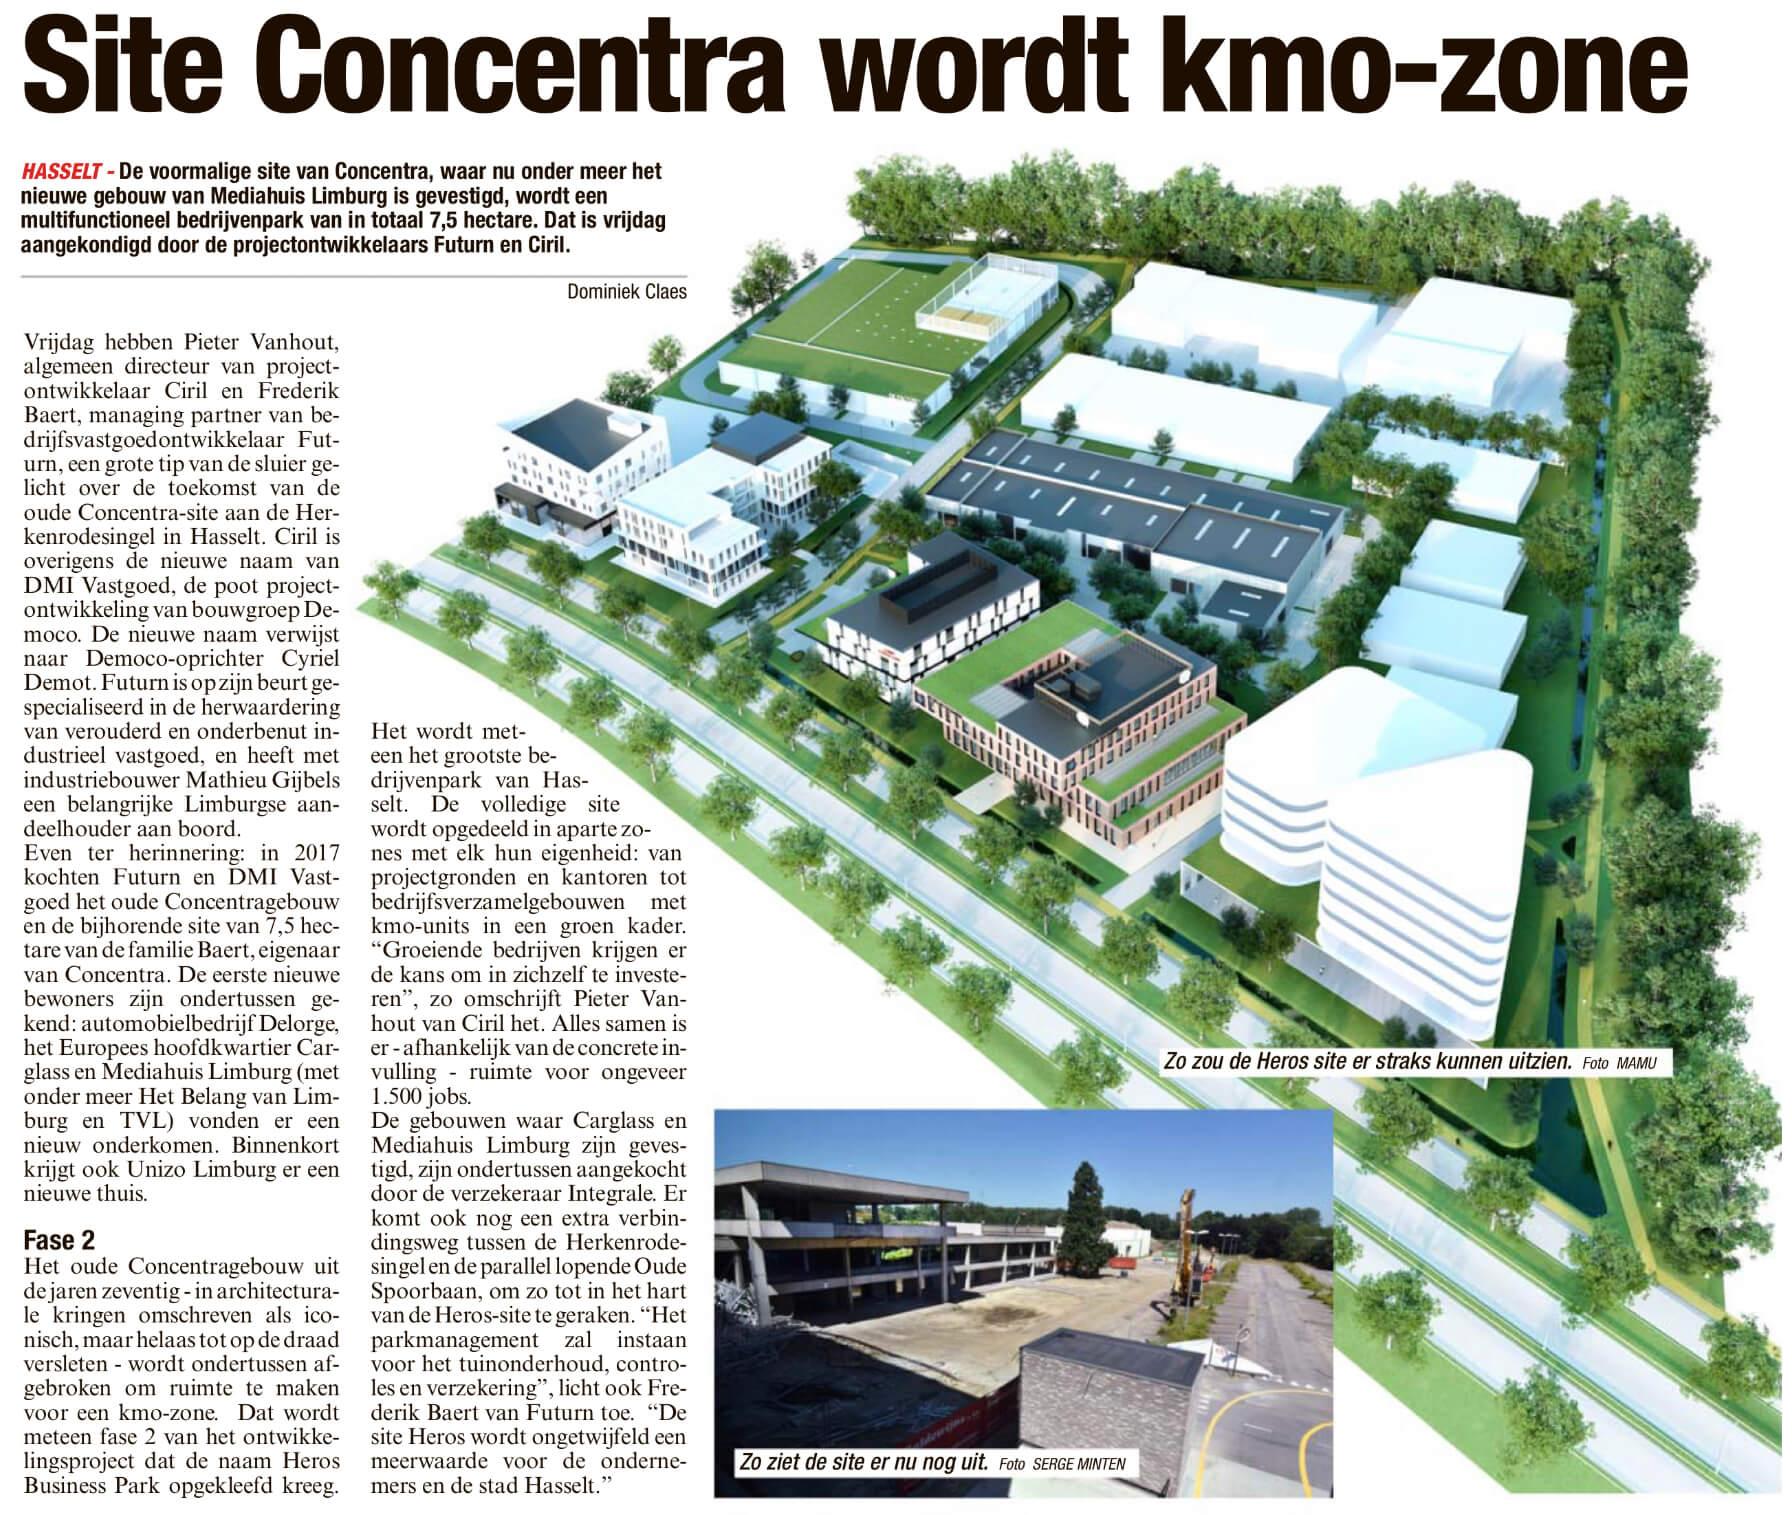 Site Concentra wordt kmo-zone